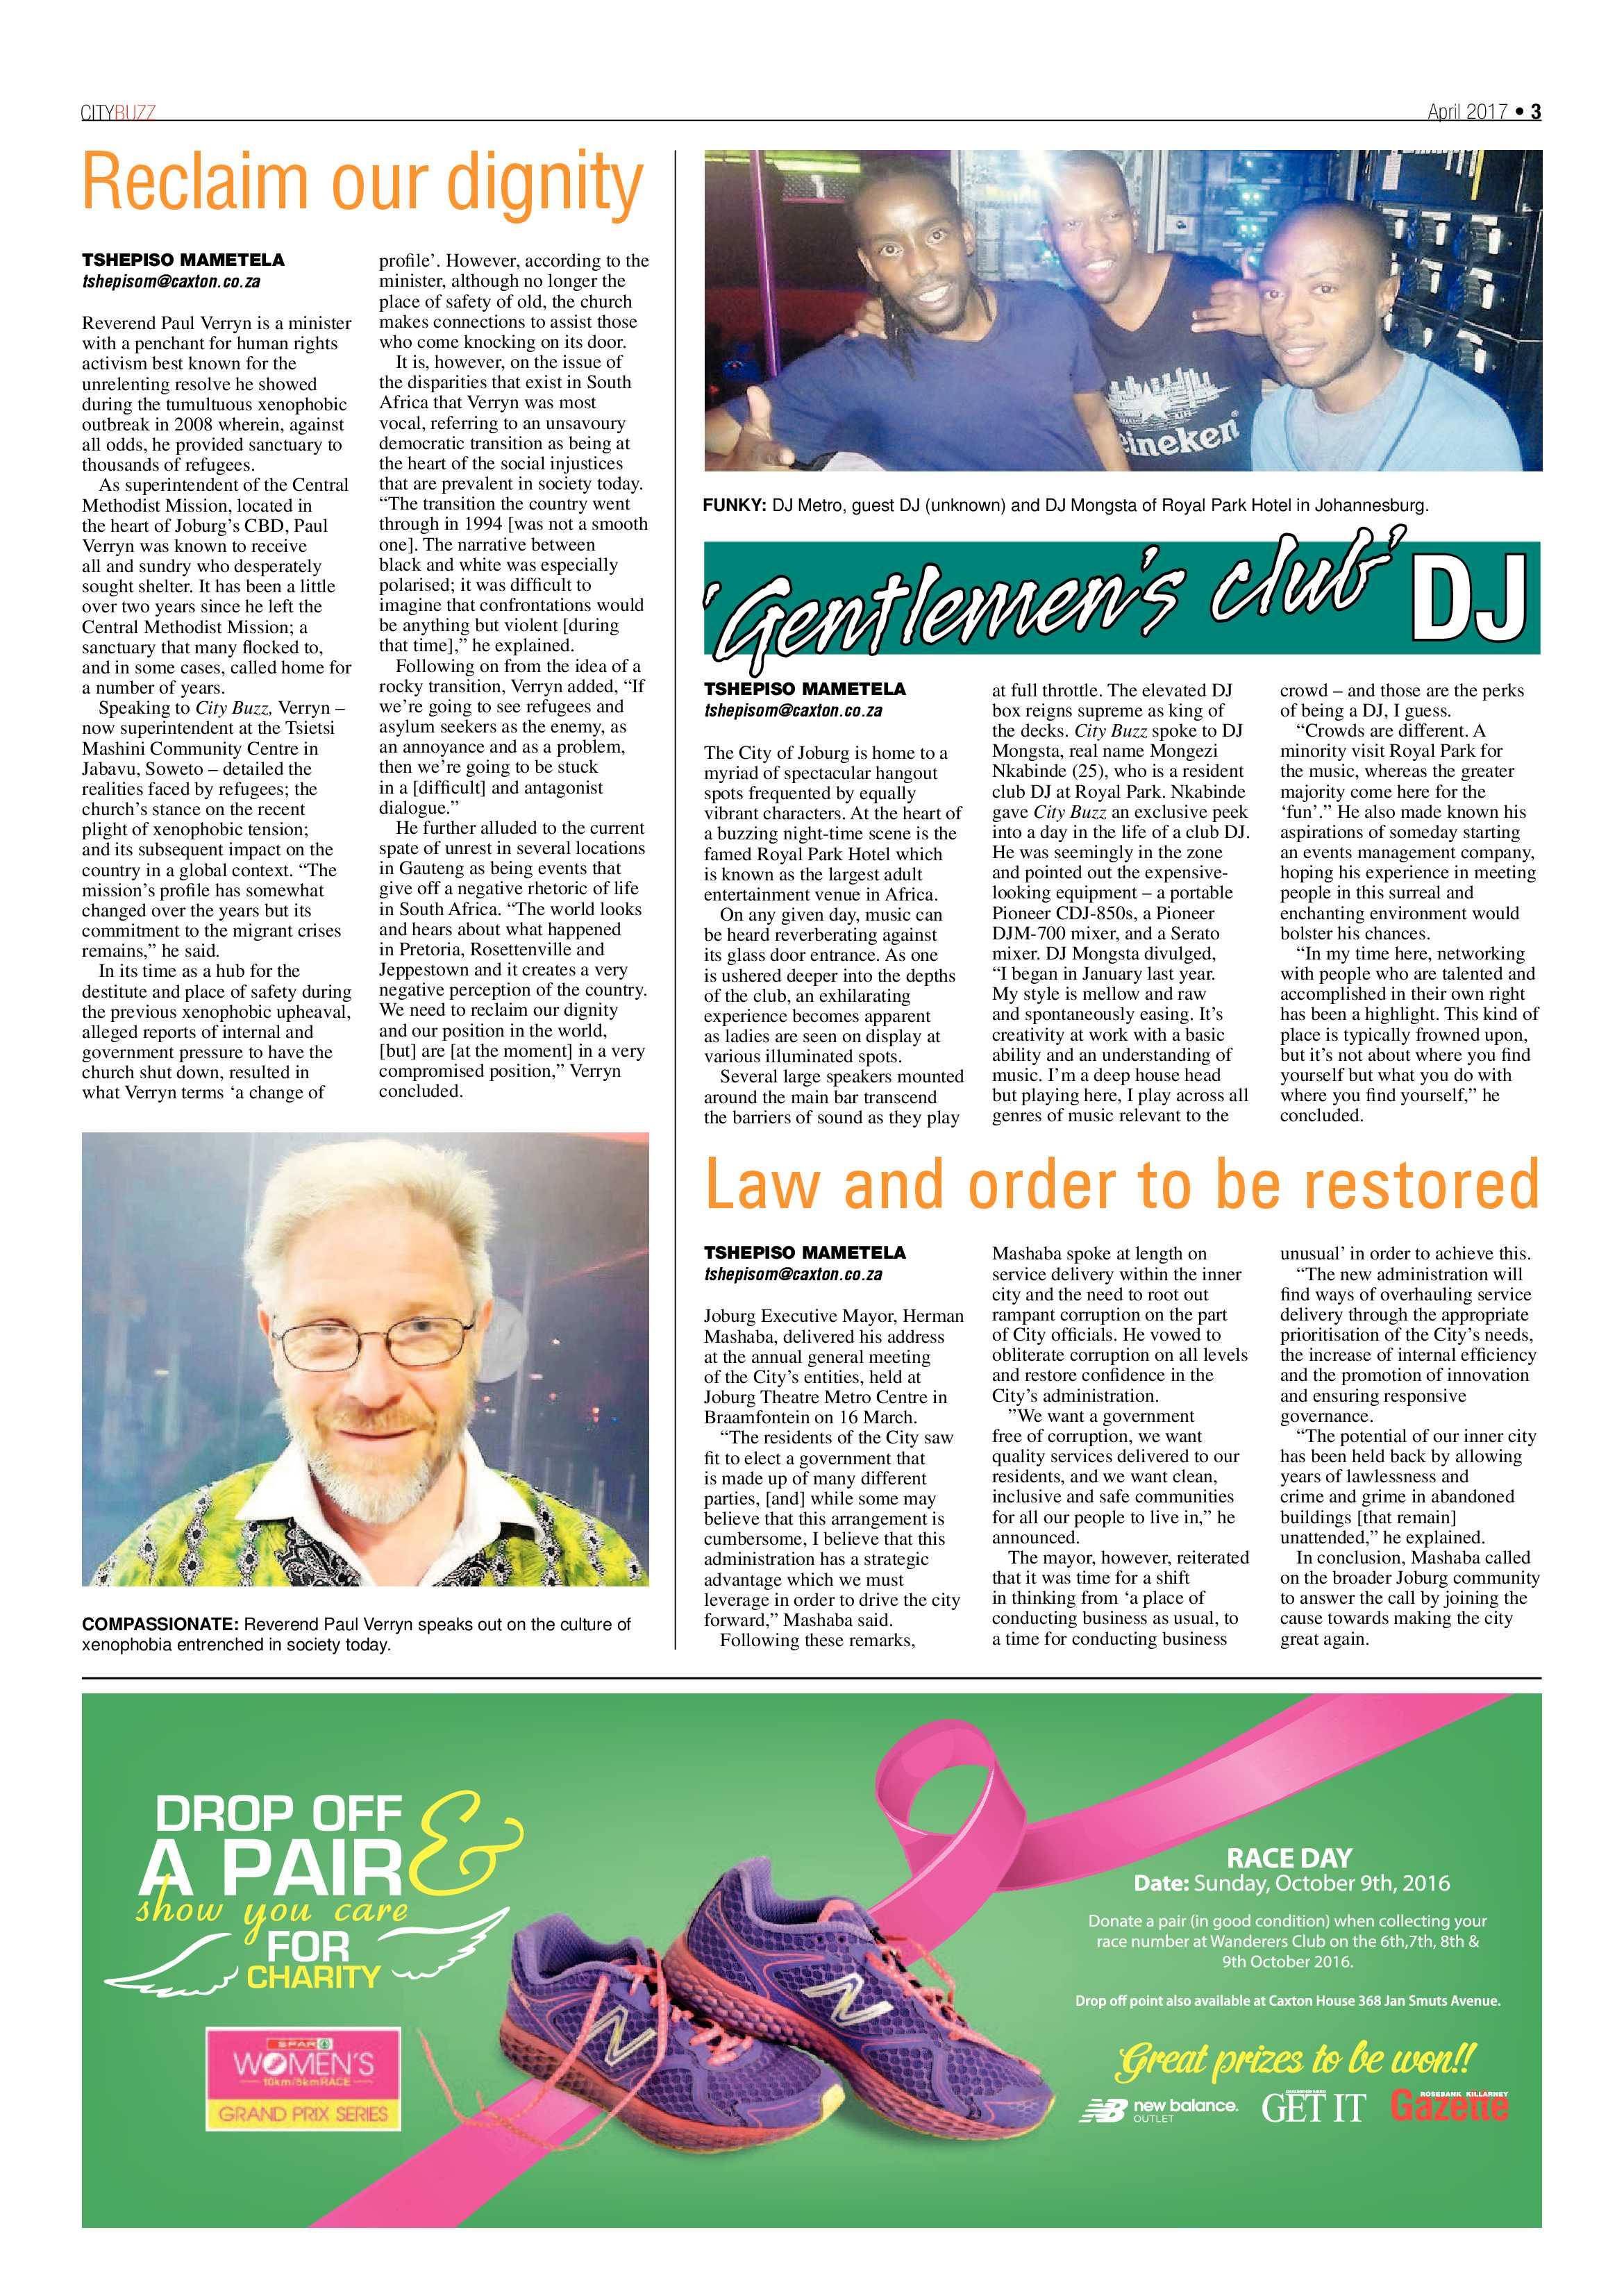 city-buzz-april-2017-epapers-page-3